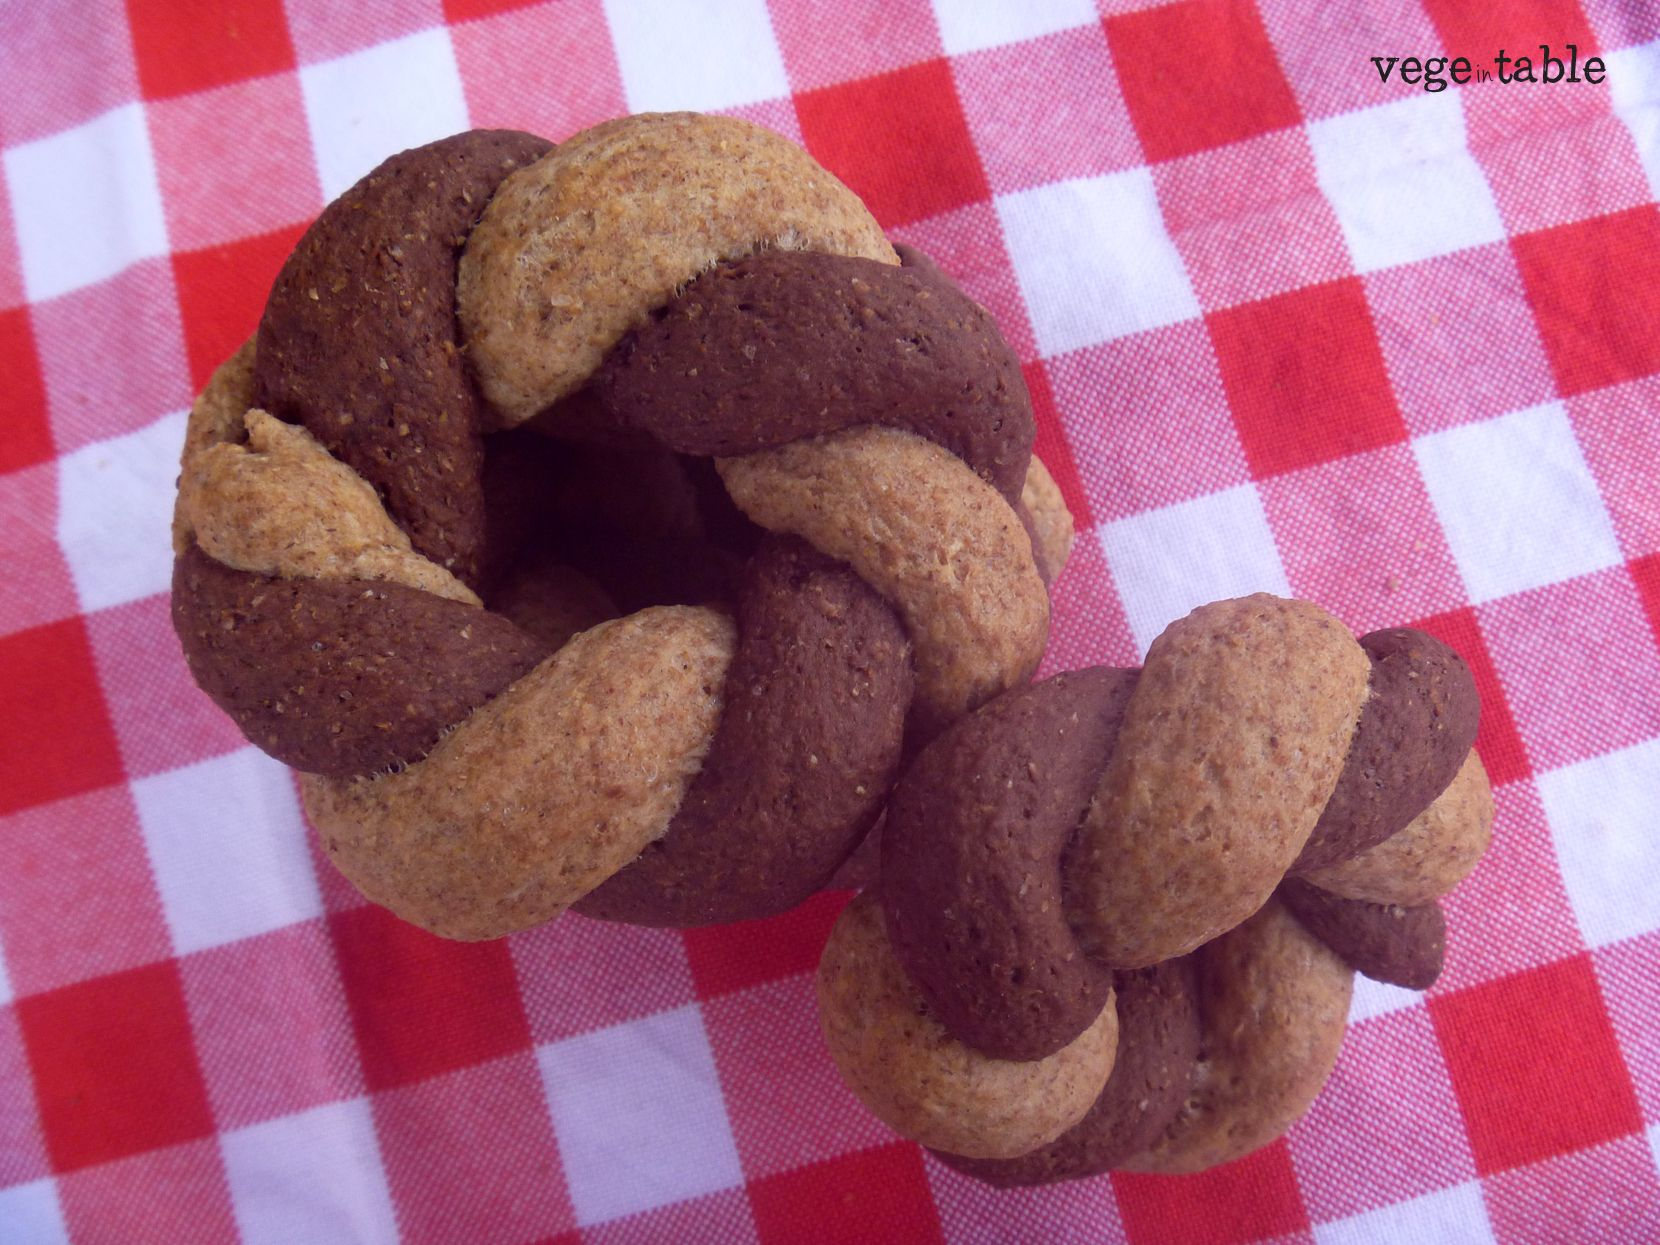 vegeintable: Christmas Garland with Cinnamon (vegan)